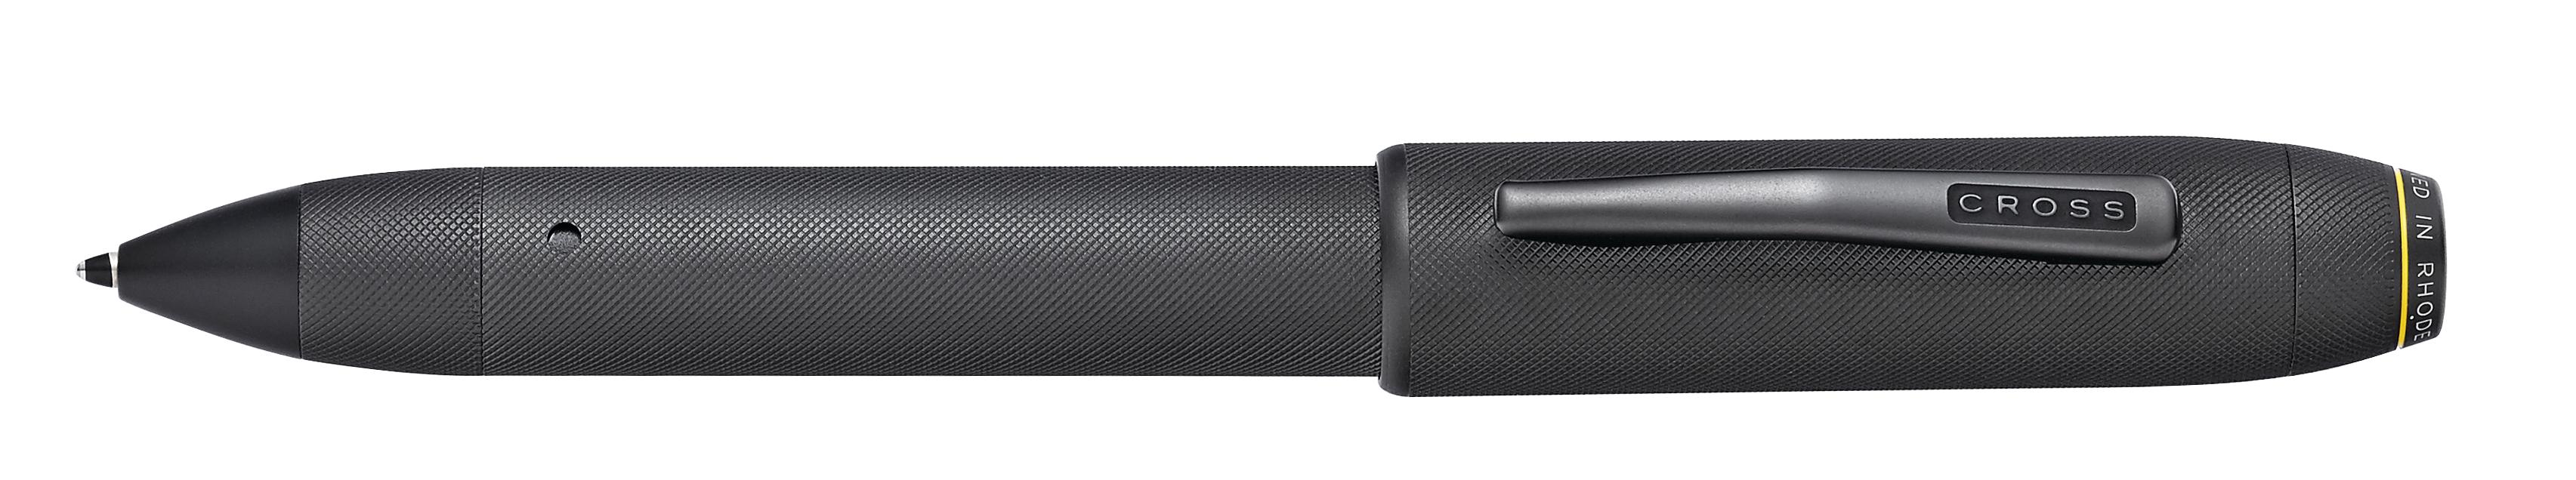 Tech Pro Black Micro-knurl Fine-tip Active Stylus and Ballpoint Pen